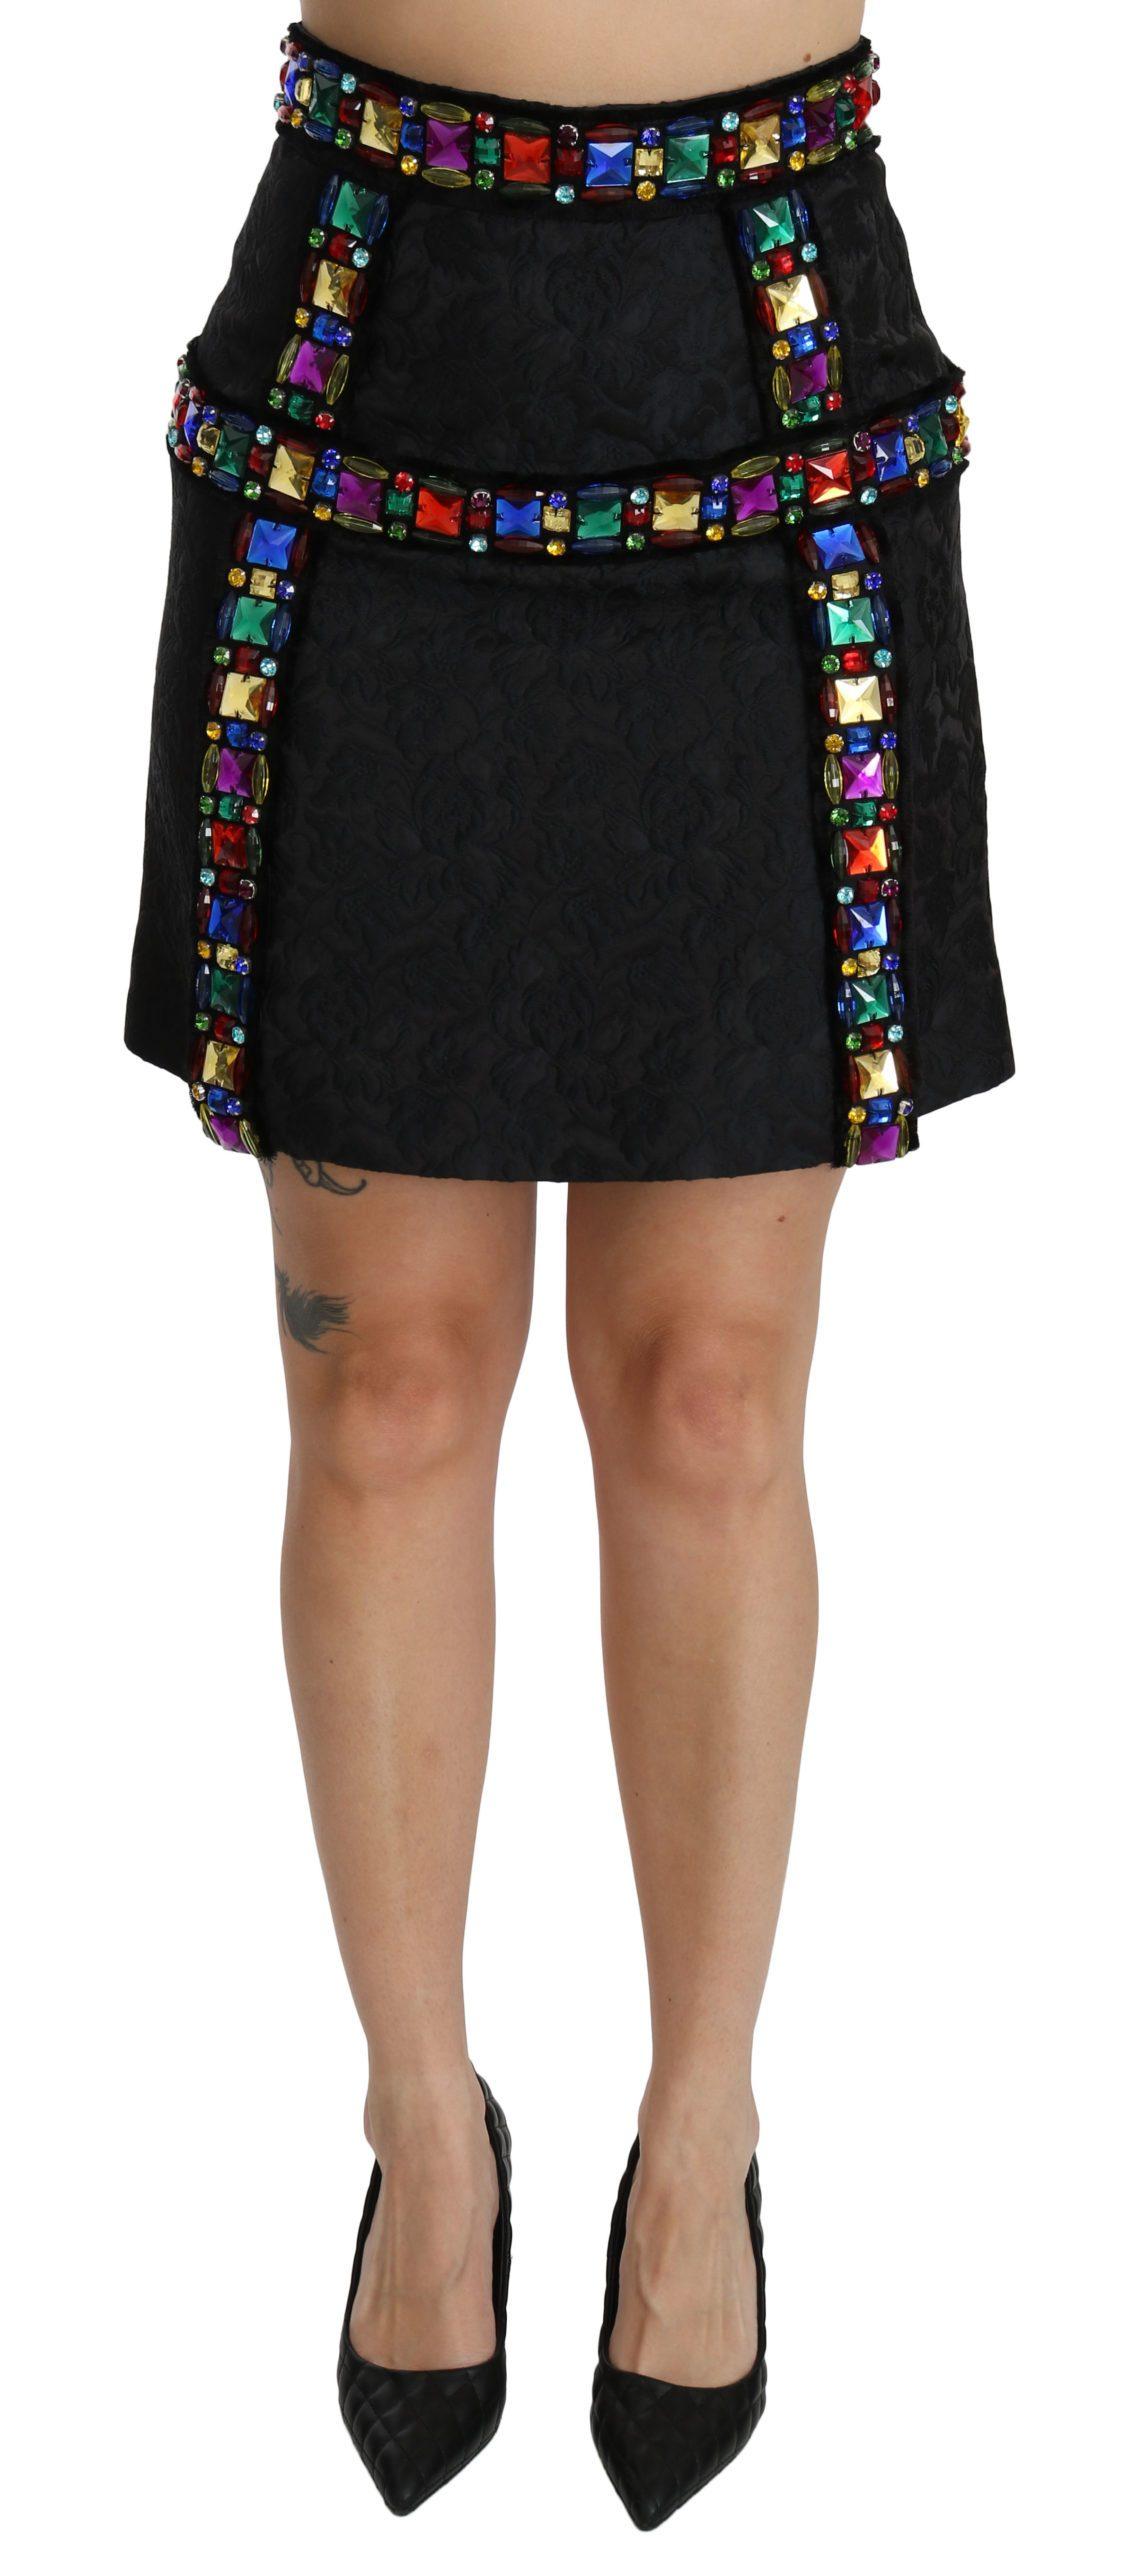 Dolce & Gabbana Women's Crystal Embellished Waist Skirt Black SKI1357 - IT38 XS